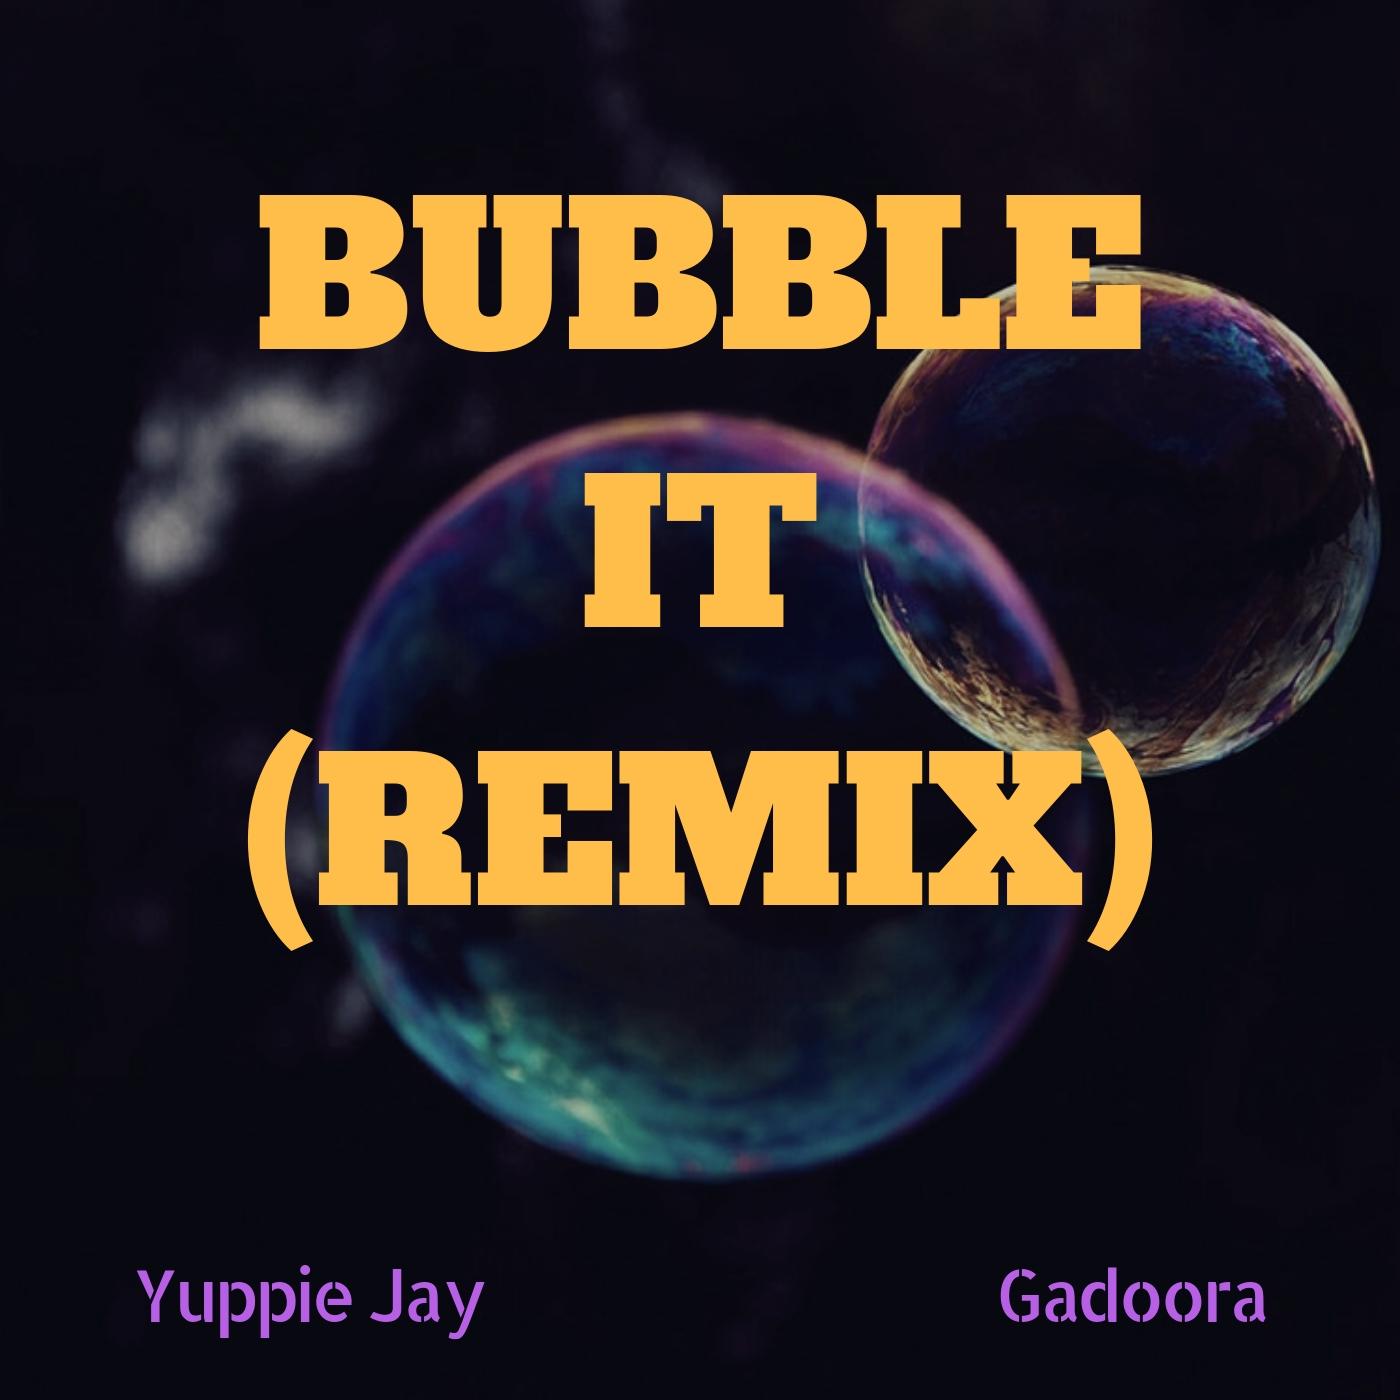 Pencil case bubble guppies original nick jr. Music video.